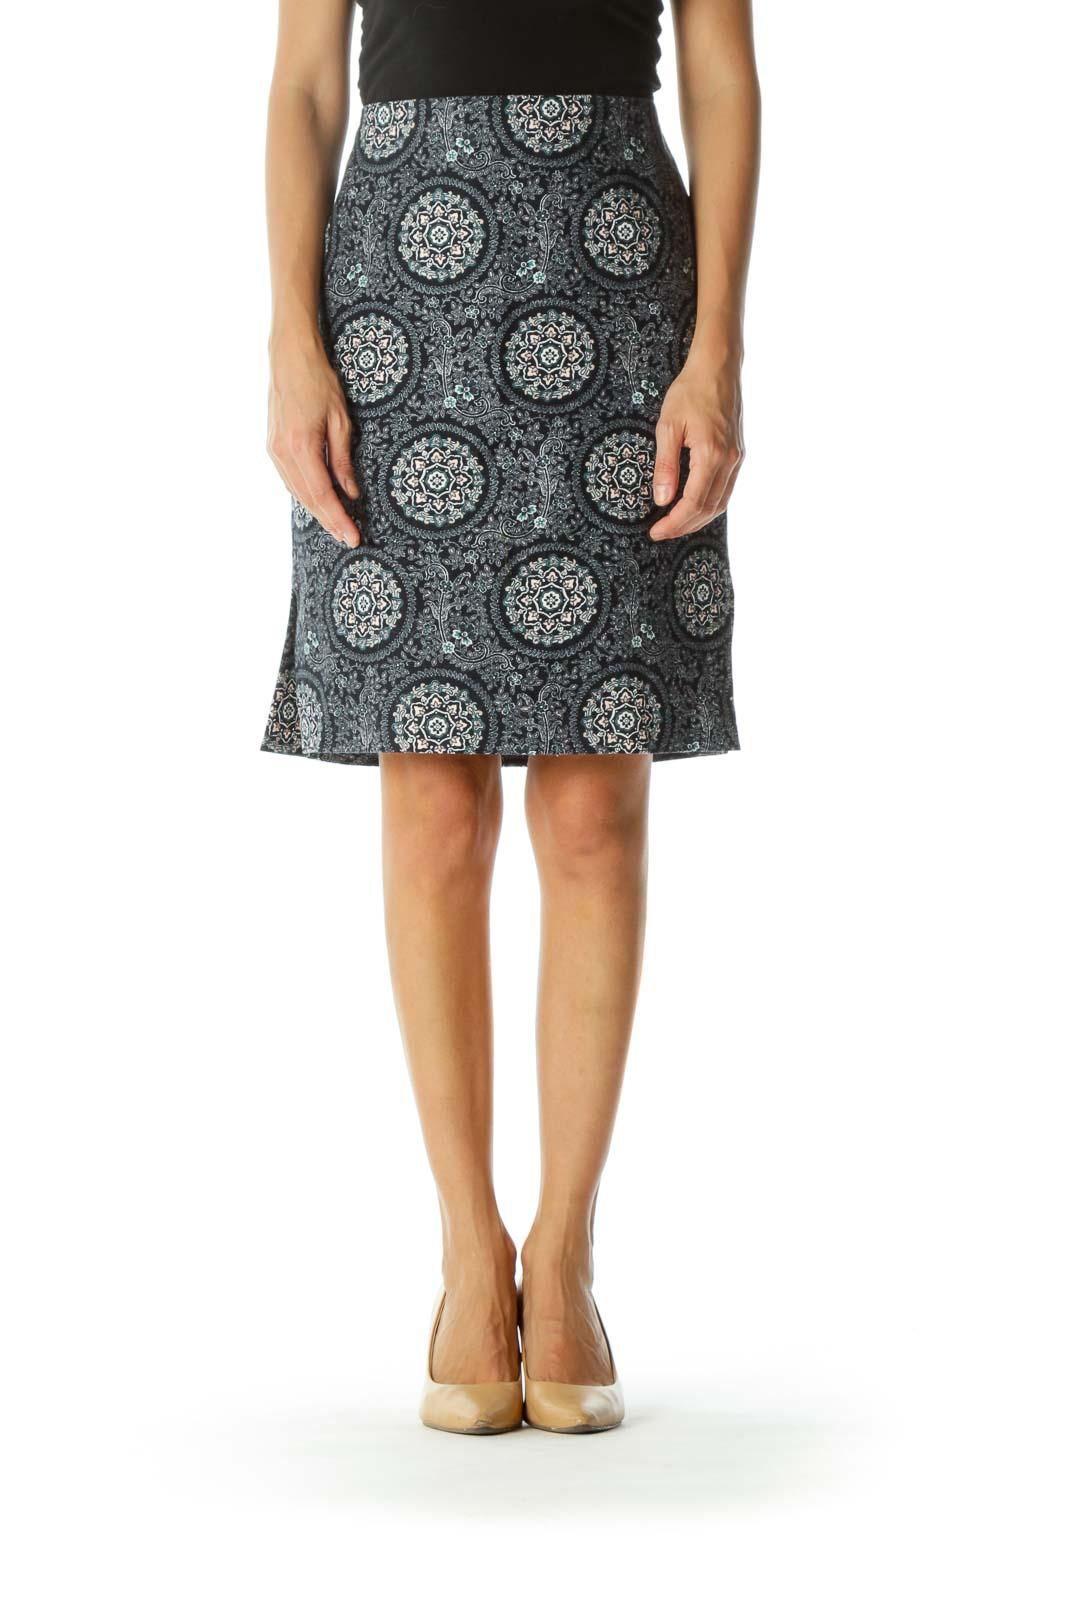 Blue Pink White Print Sides-Leg Slit Textured Skirt (Petite)